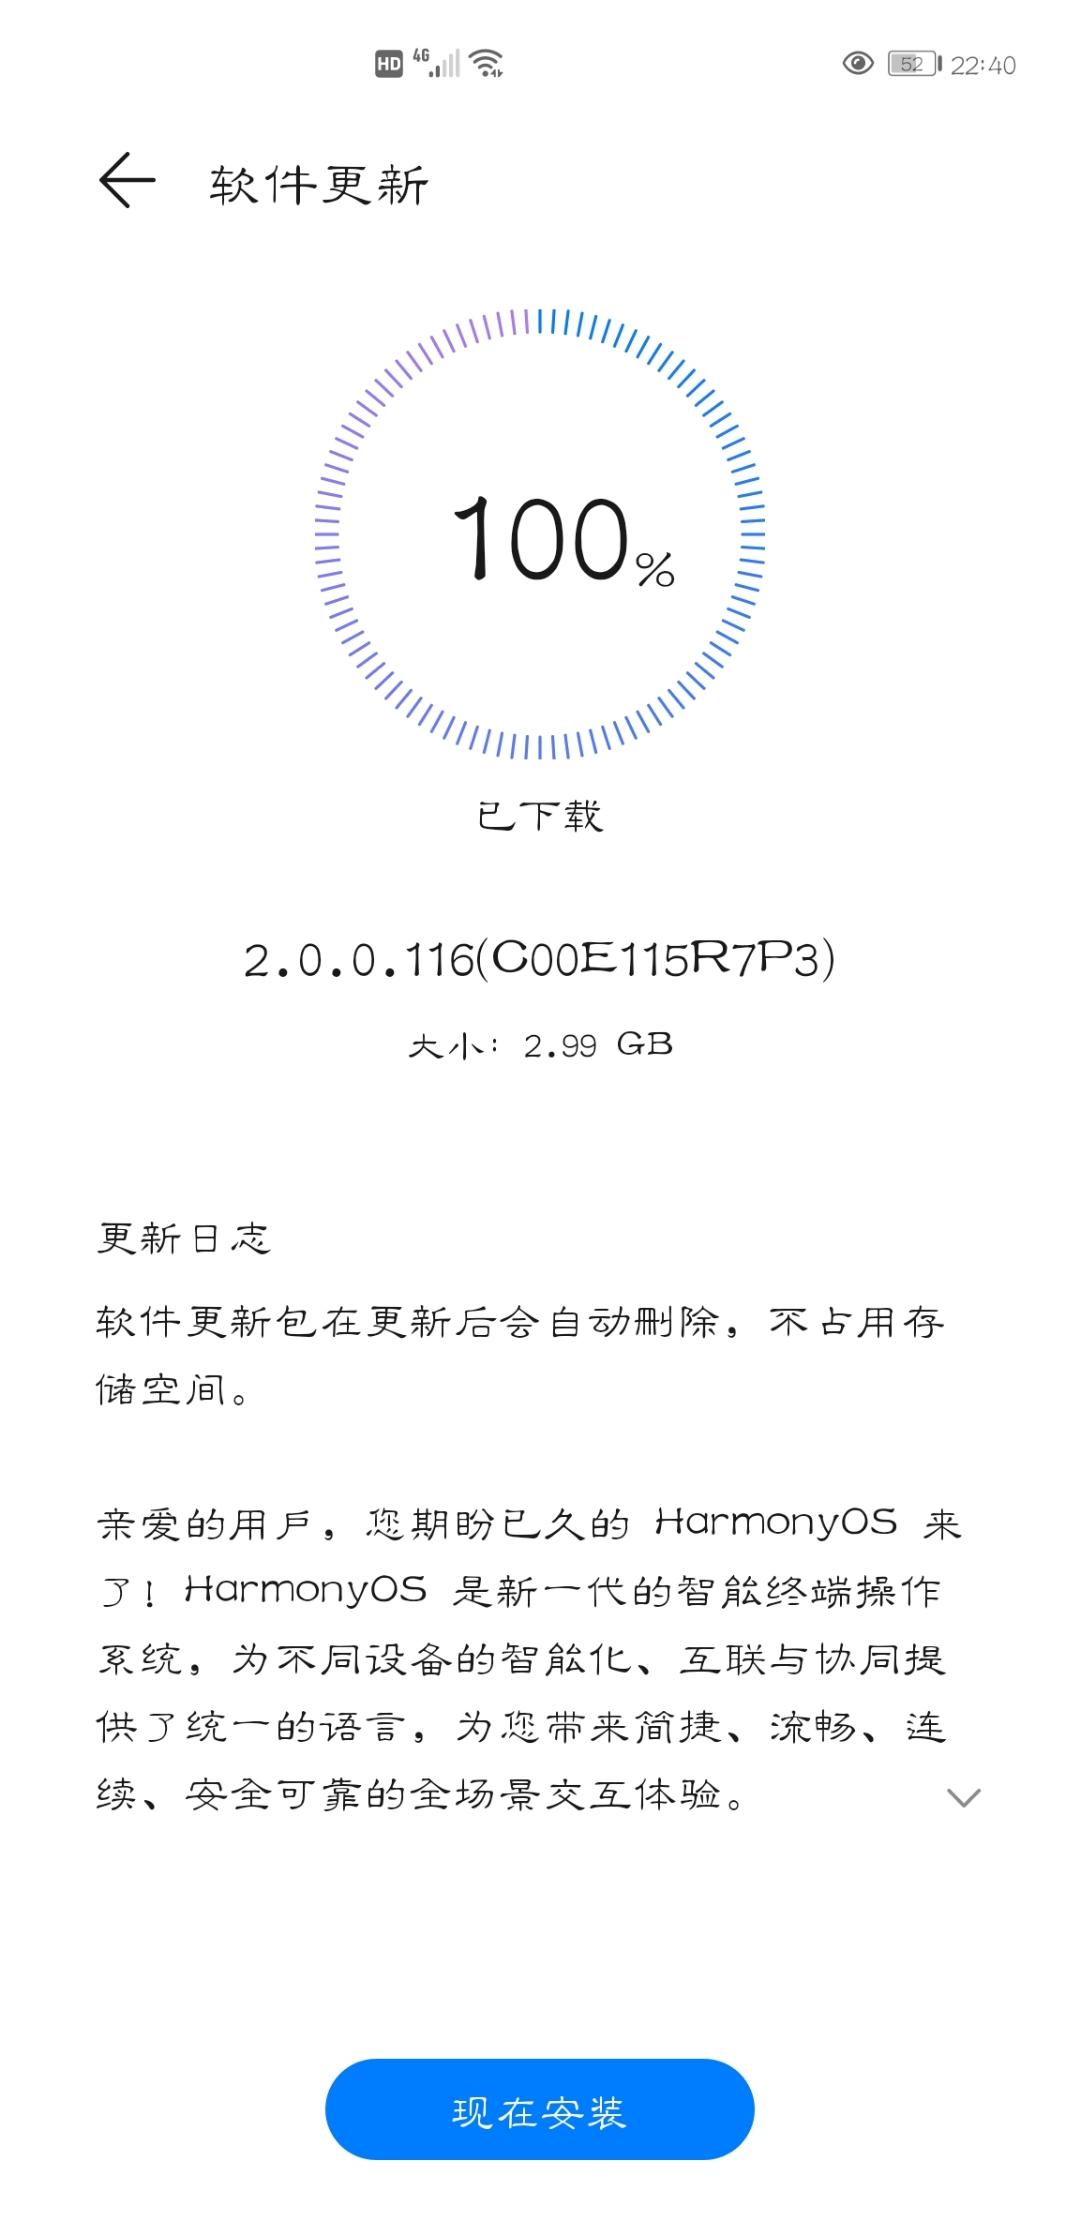 Screenshot_20210608_224018_com.huawei.android.hwouc.jpg